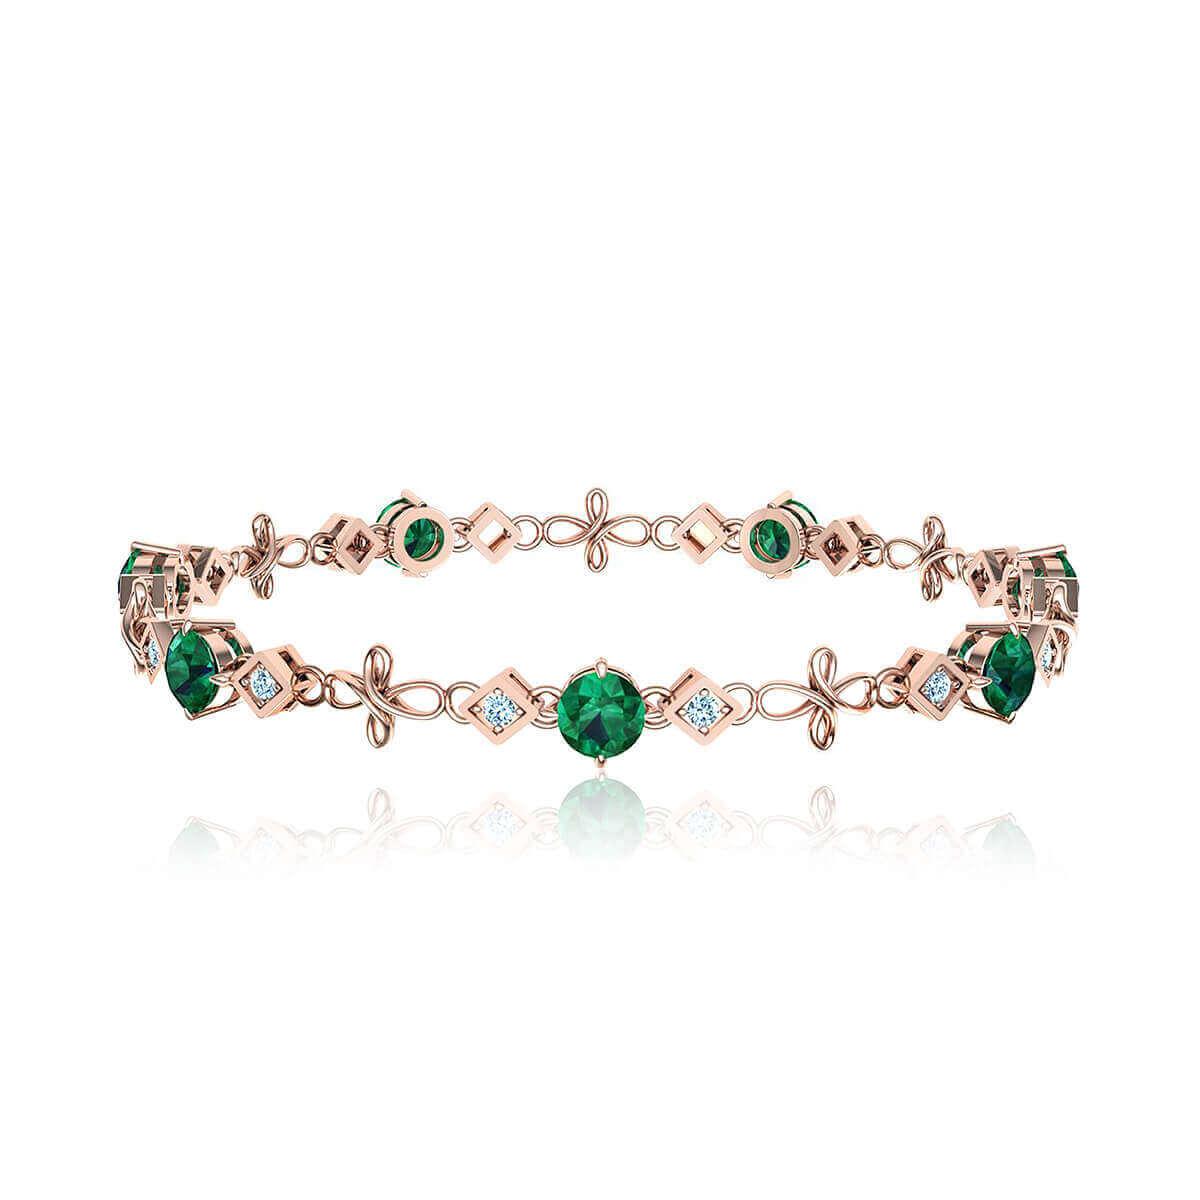 Bashford Lorna Emerald and Diamond Bracelet (1/2 CT. TW.)